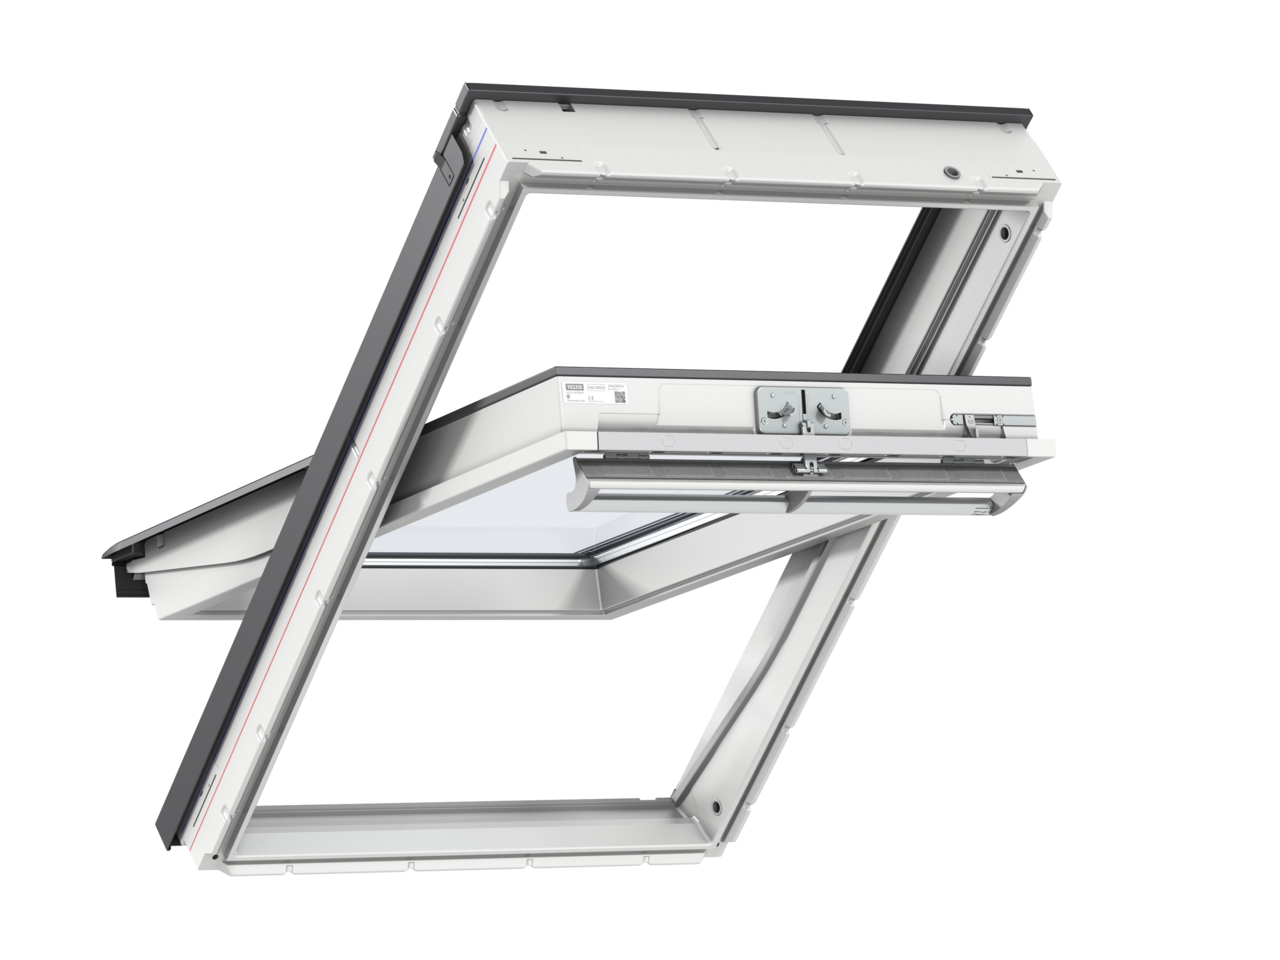 Velux GGU MK08 780 x 1400mm Centre Pivot 34Pane Roof Window - White Polyurethane